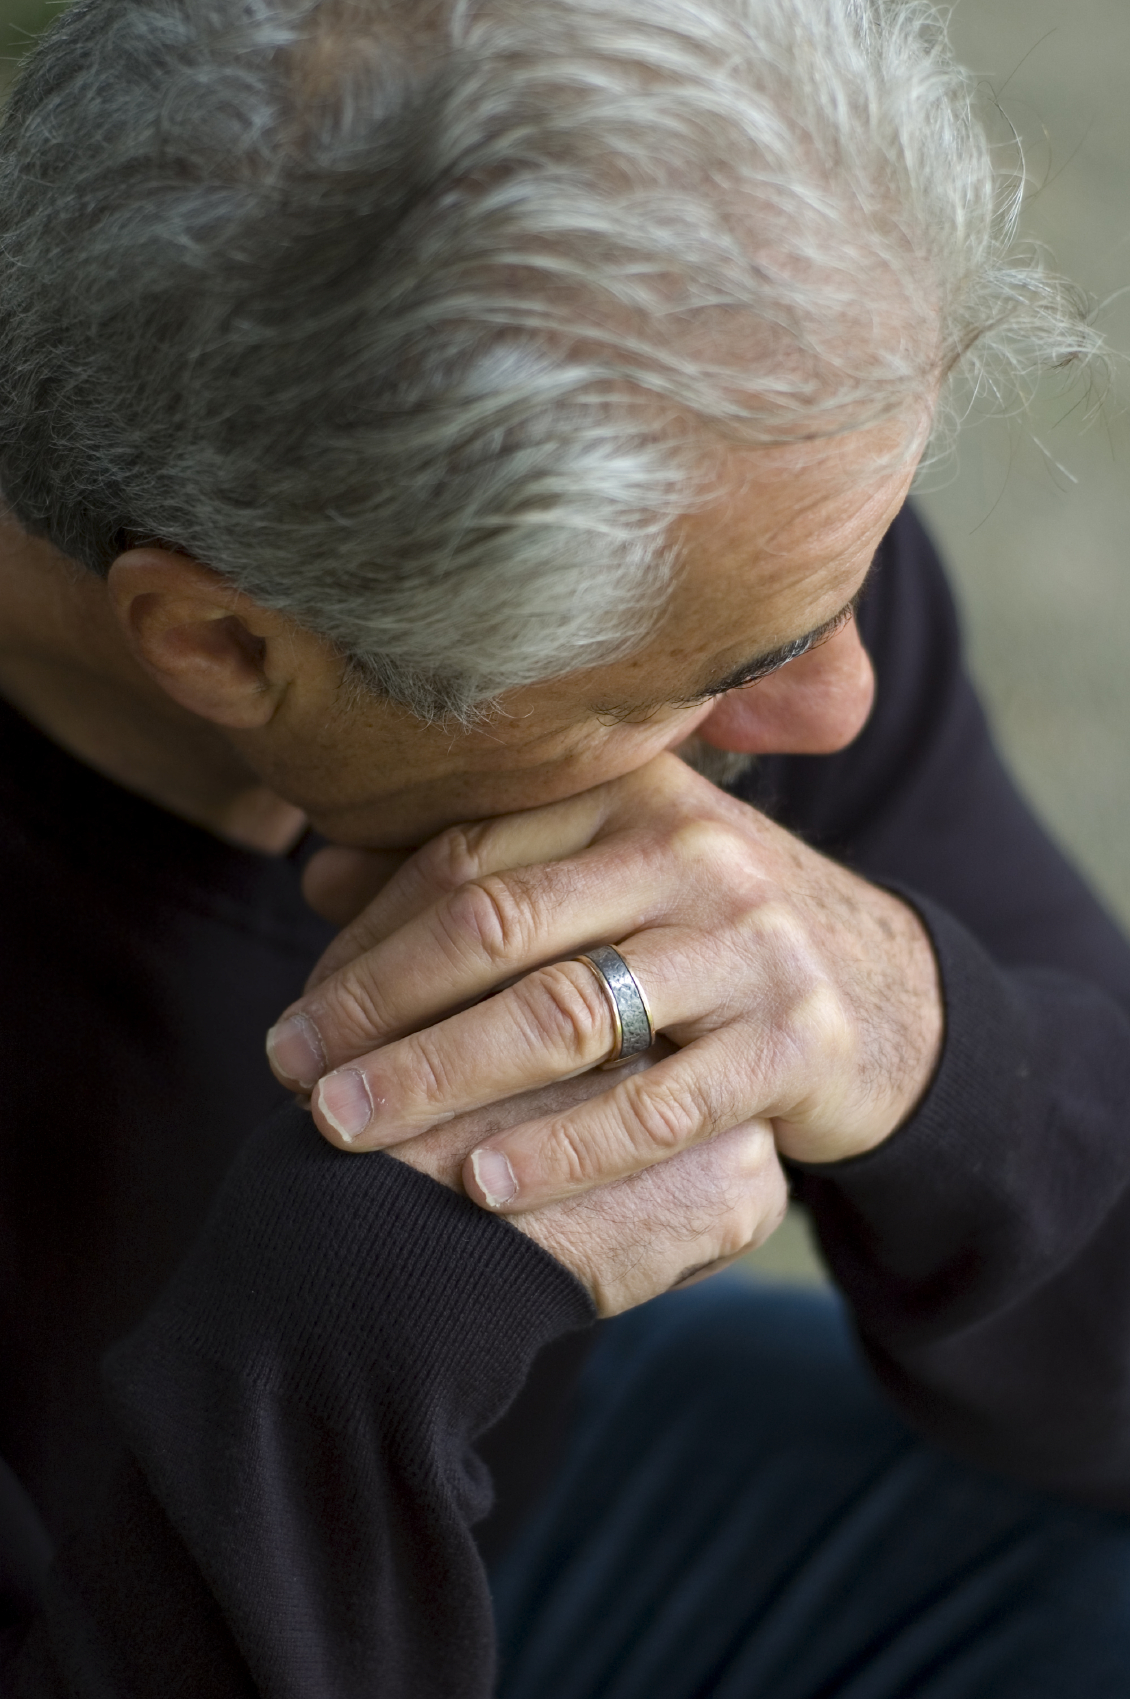 Antidepressants Linked to Risk of Stroke